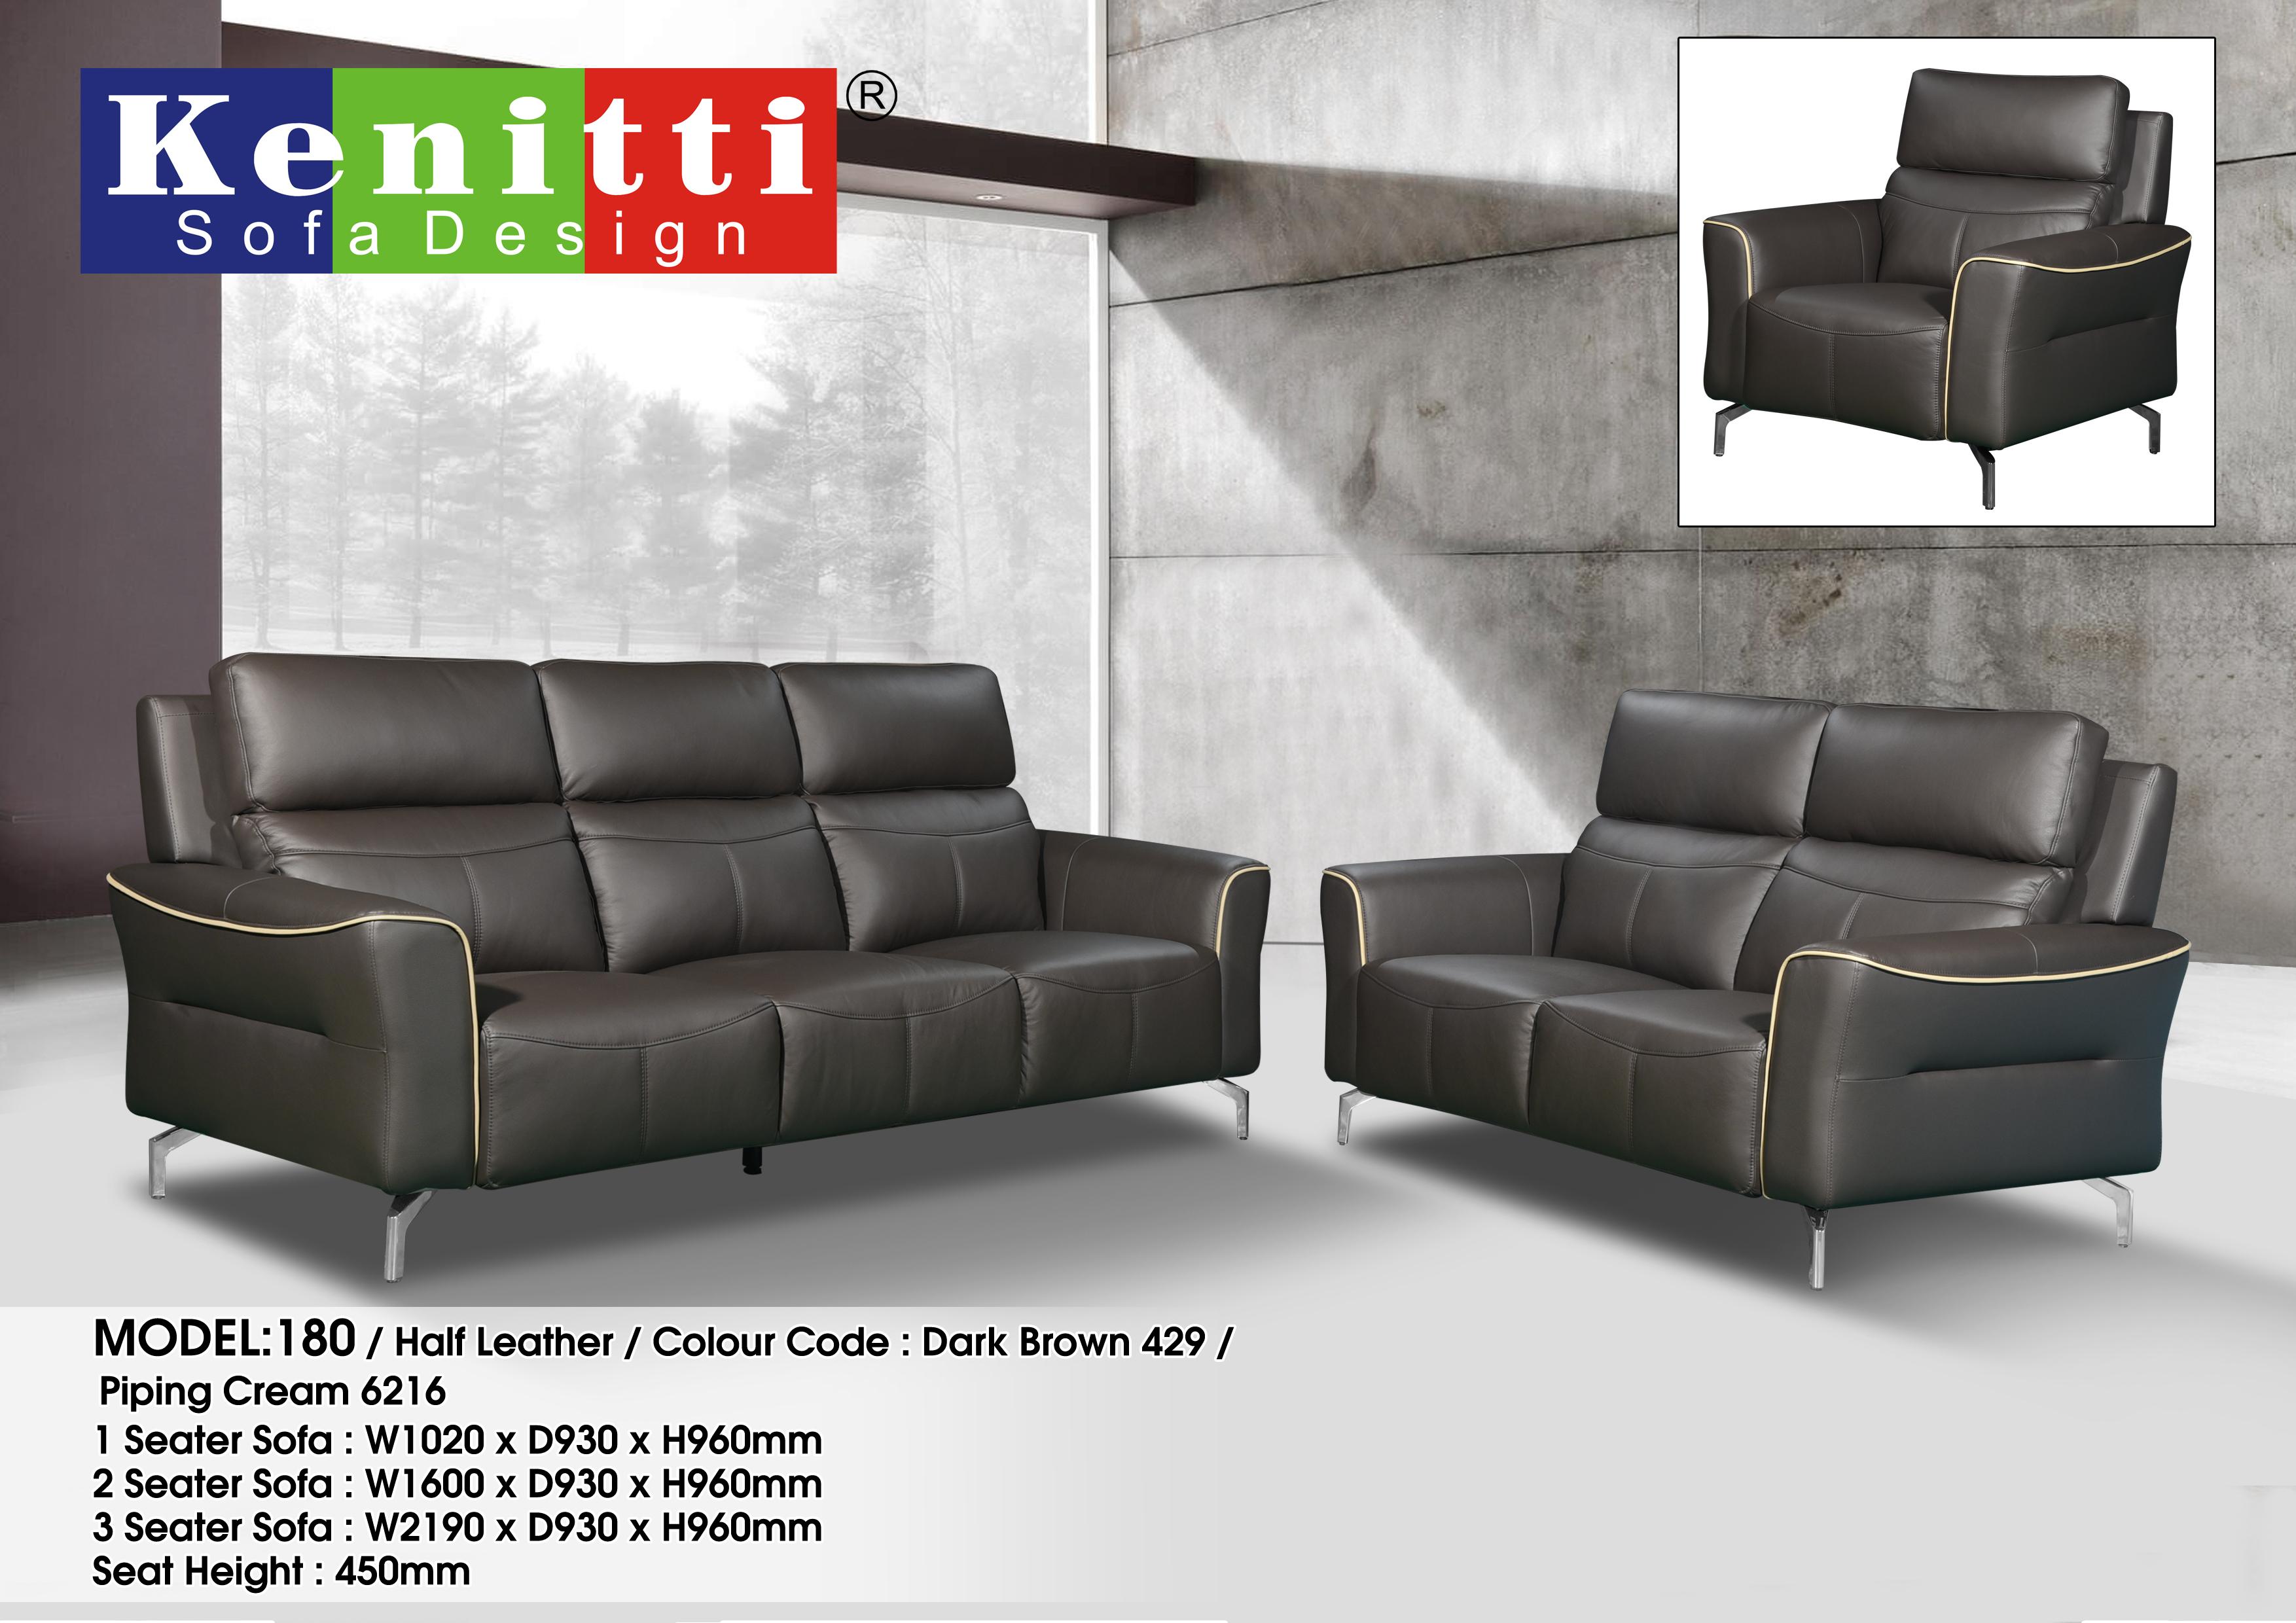 Model - 180 - 1 + 2 + 3 Half Leather